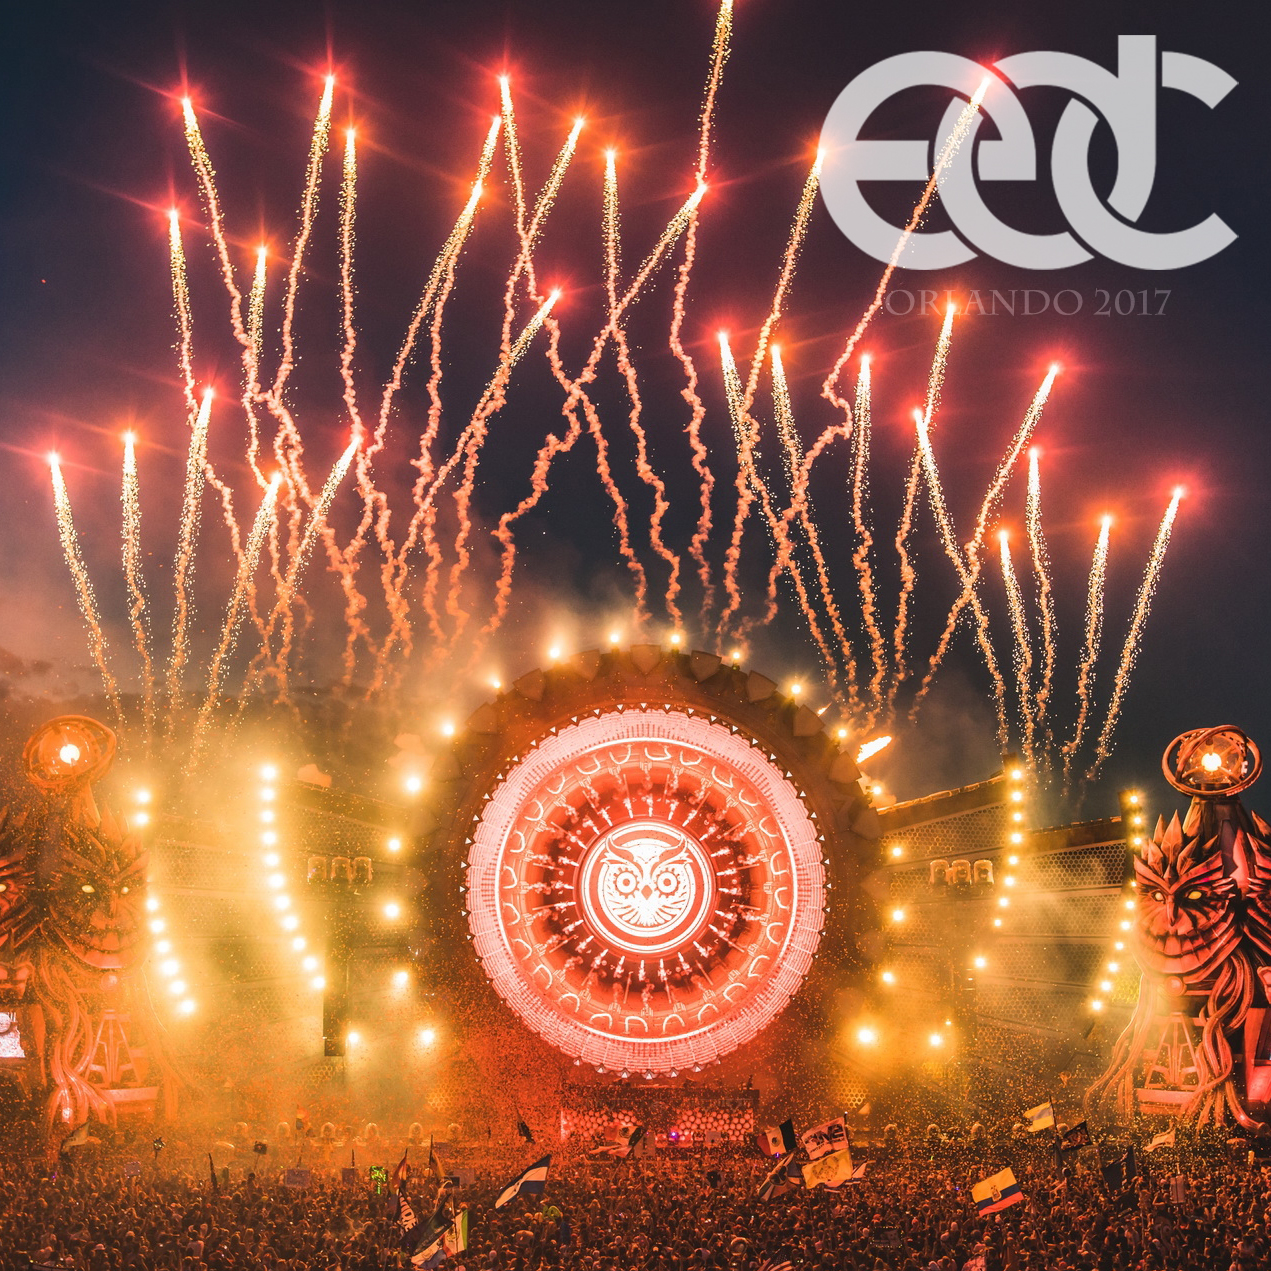 EDC ORLANDO 20176.jpg